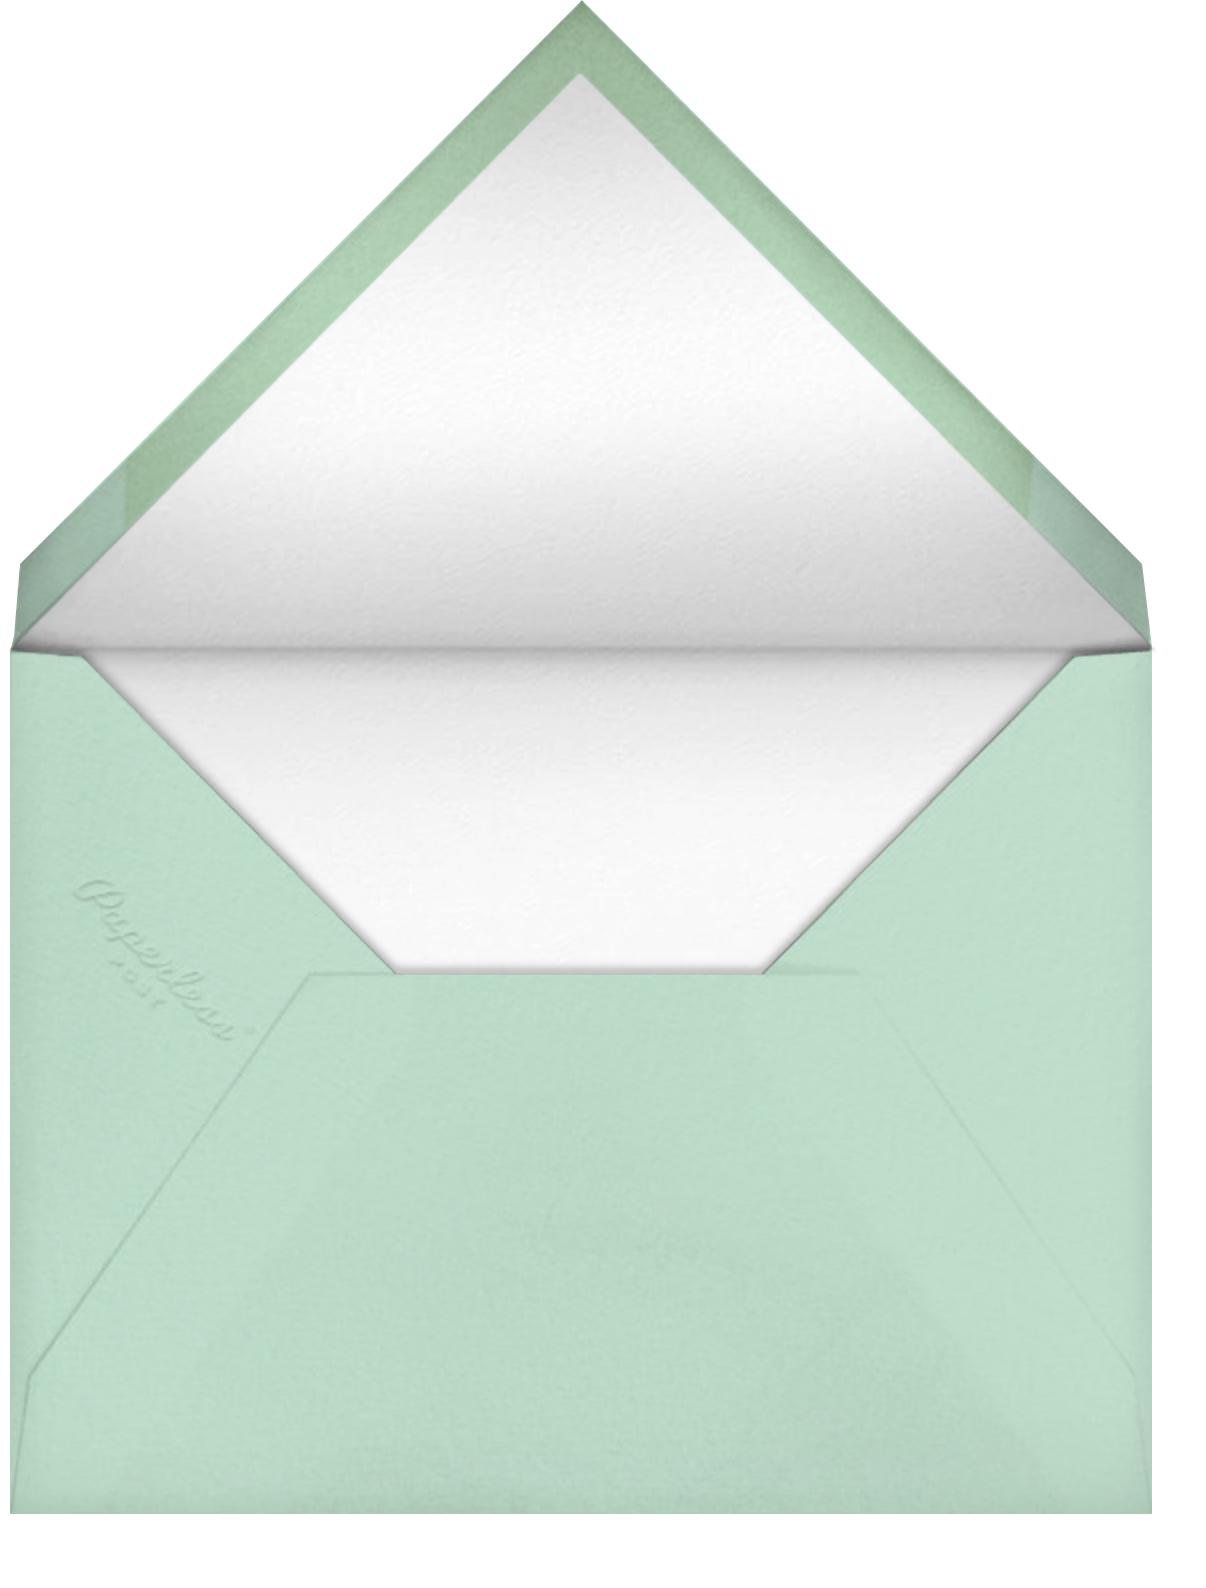 Painted Rainbow - Meri Meri - Envelope